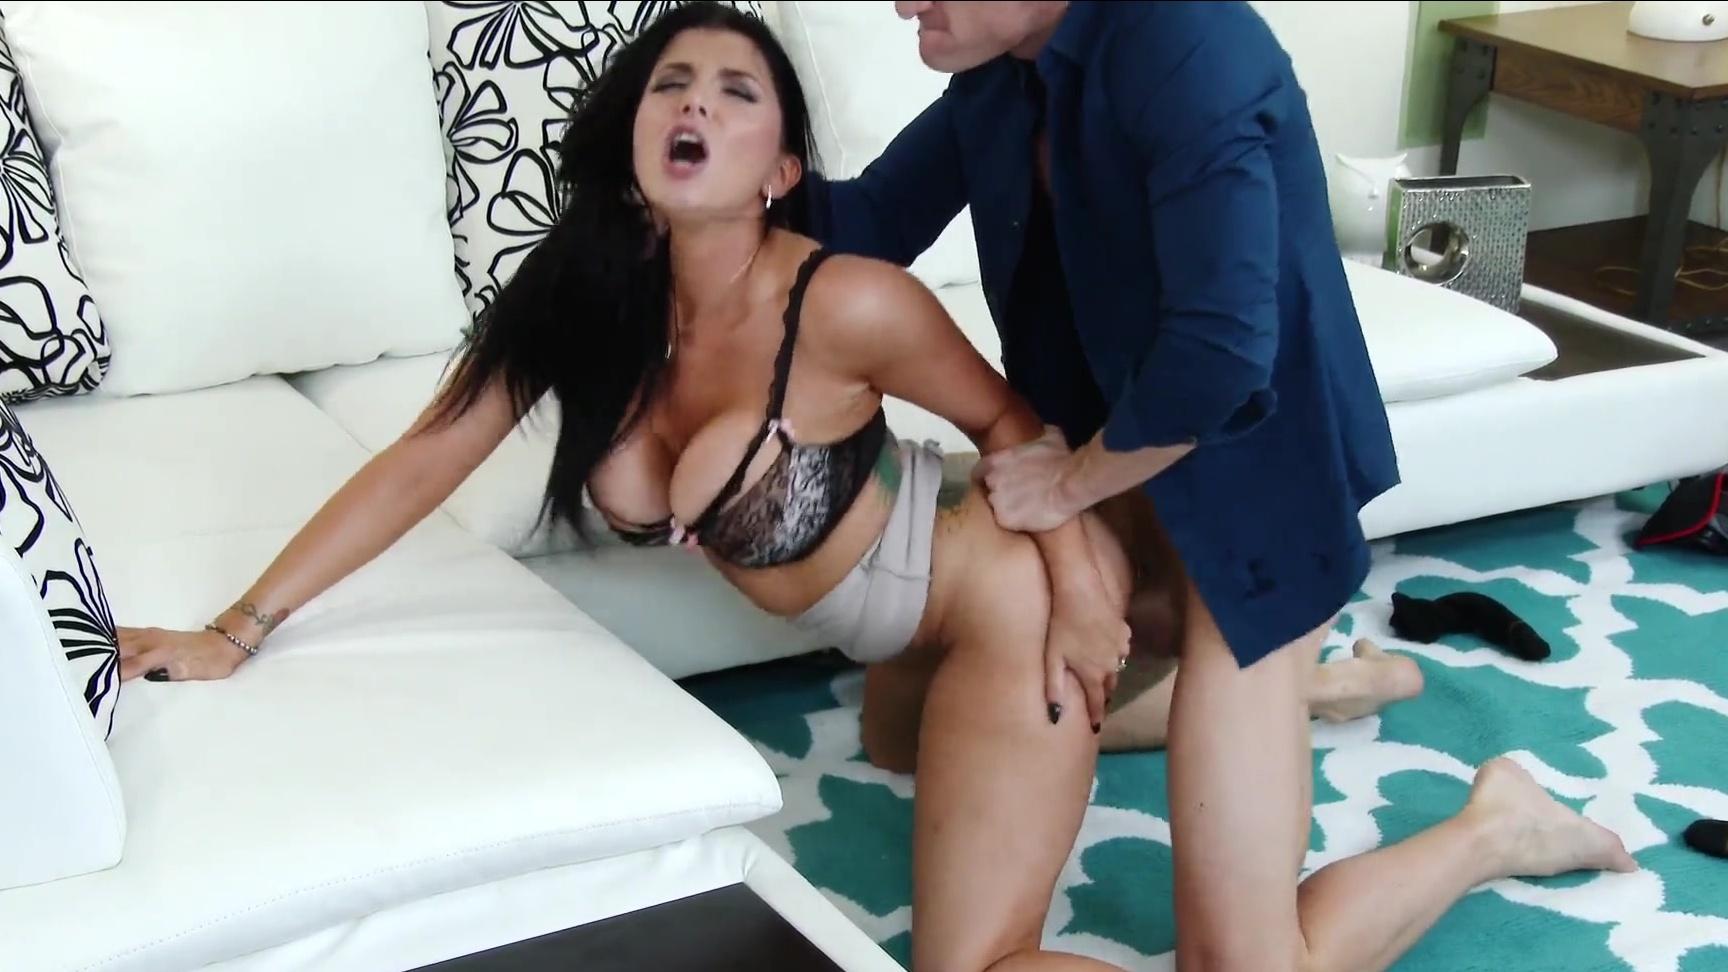 Porn at the back yard